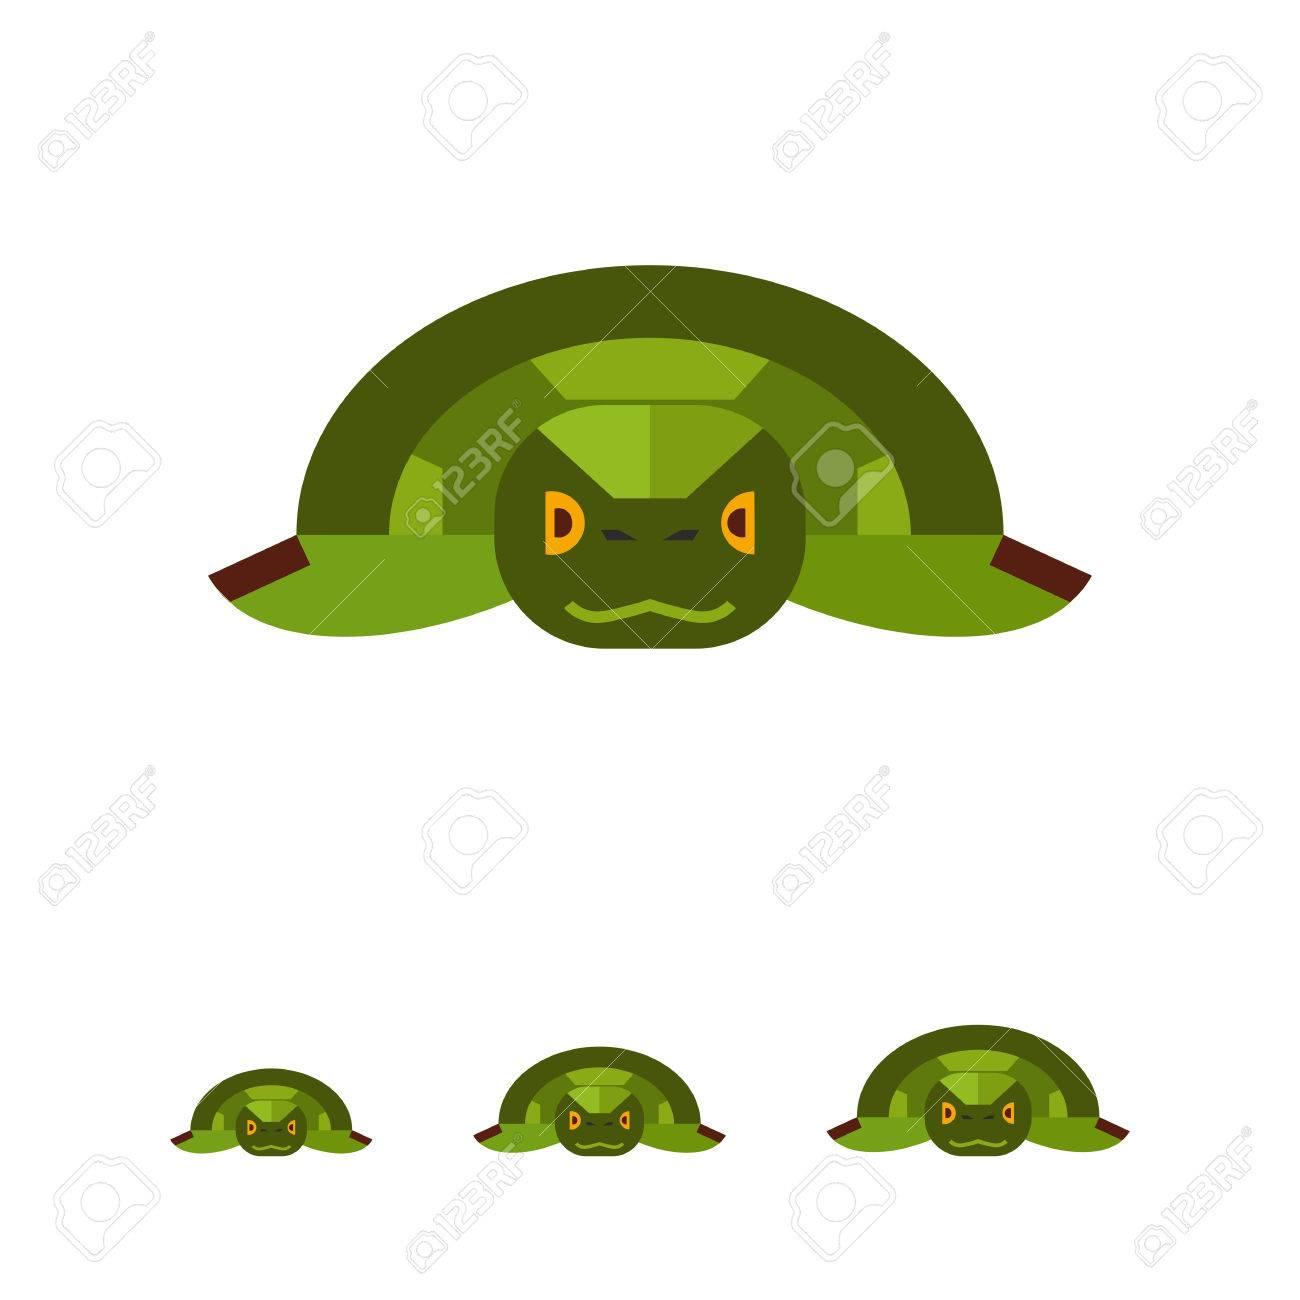 Image Of Japanese Symbolic Animal Green Sea Turtle Royalty Free